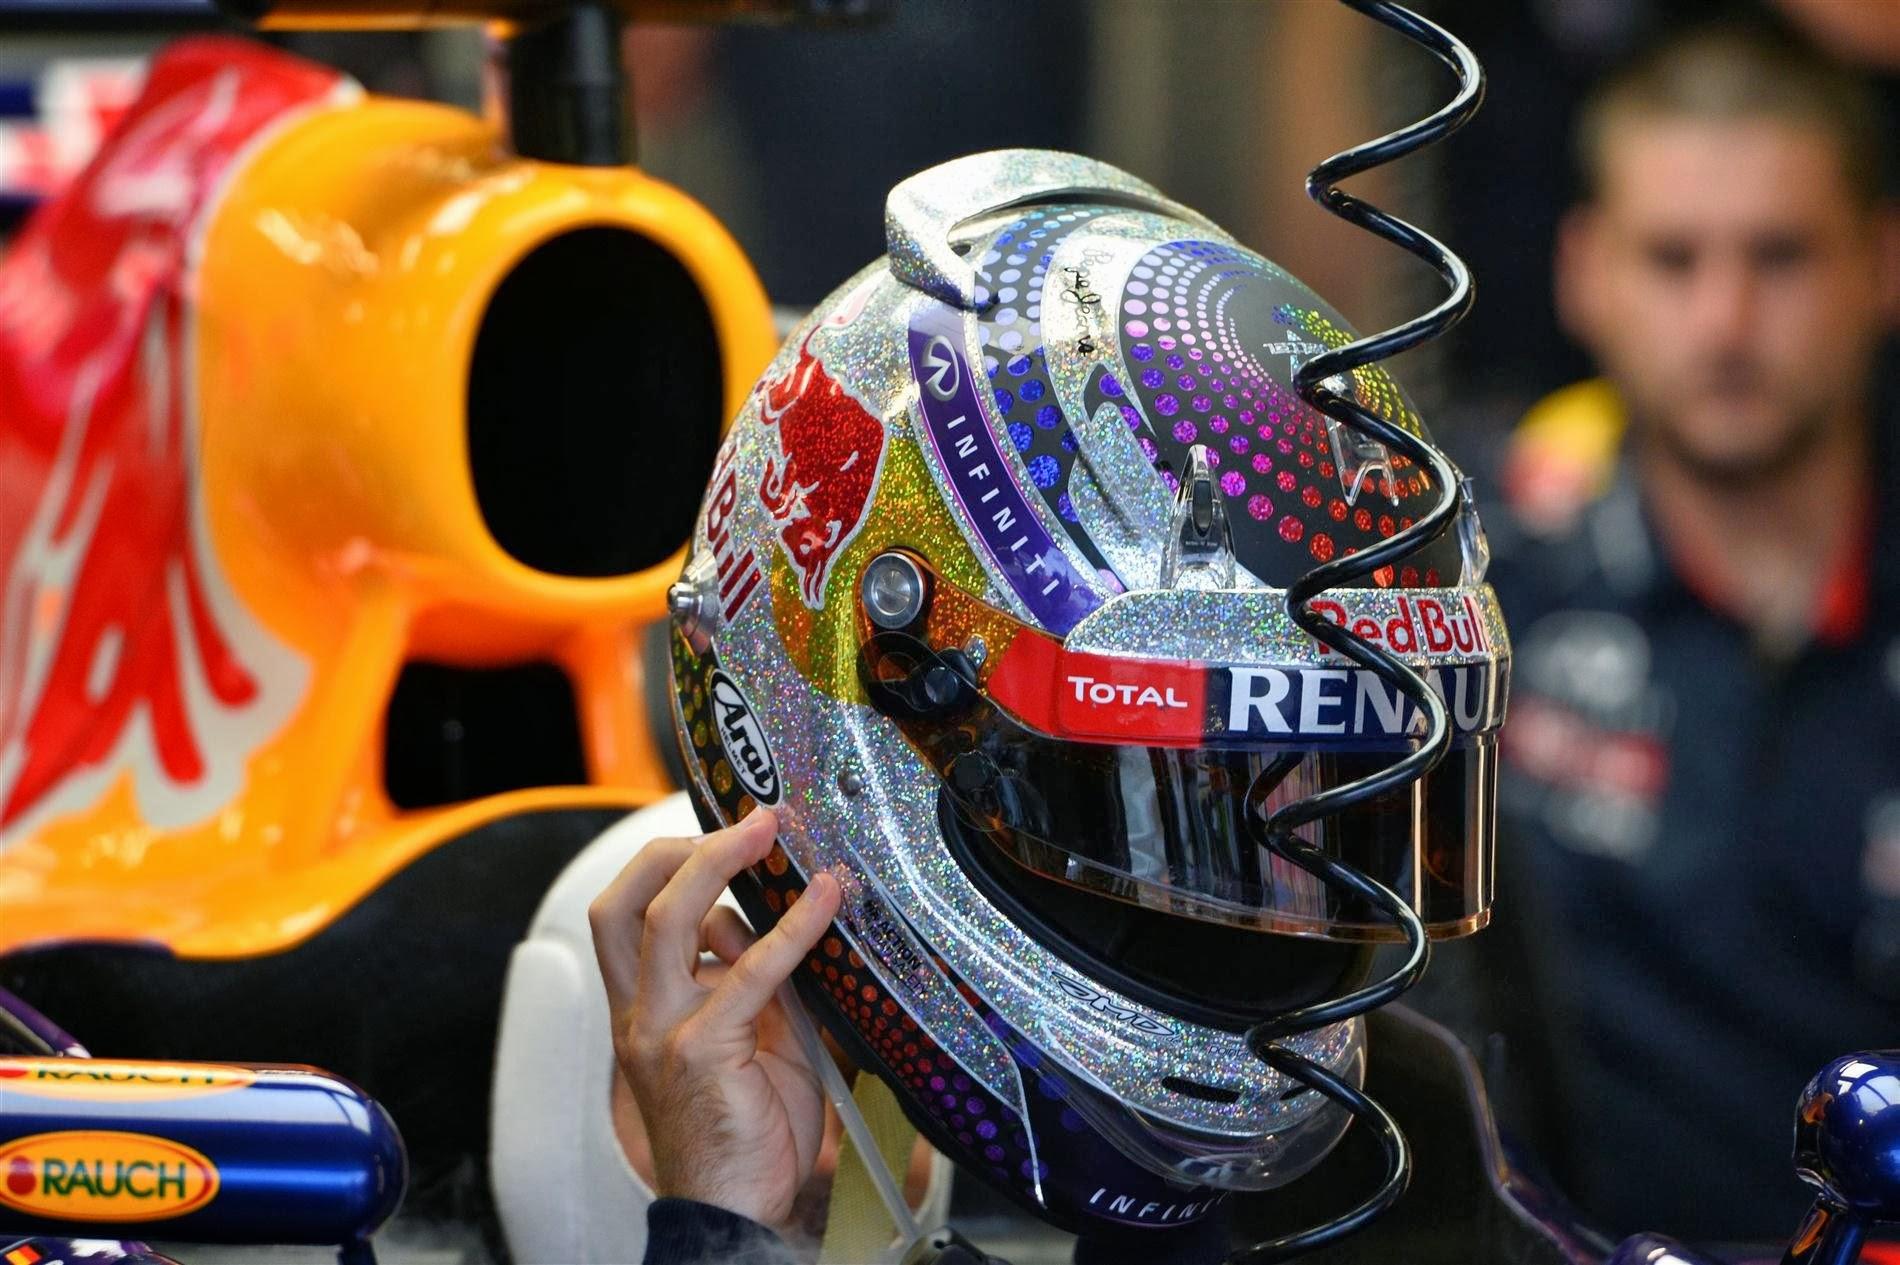 шлем Себастьяна Феттеля для Гран-при Сингапура 2013